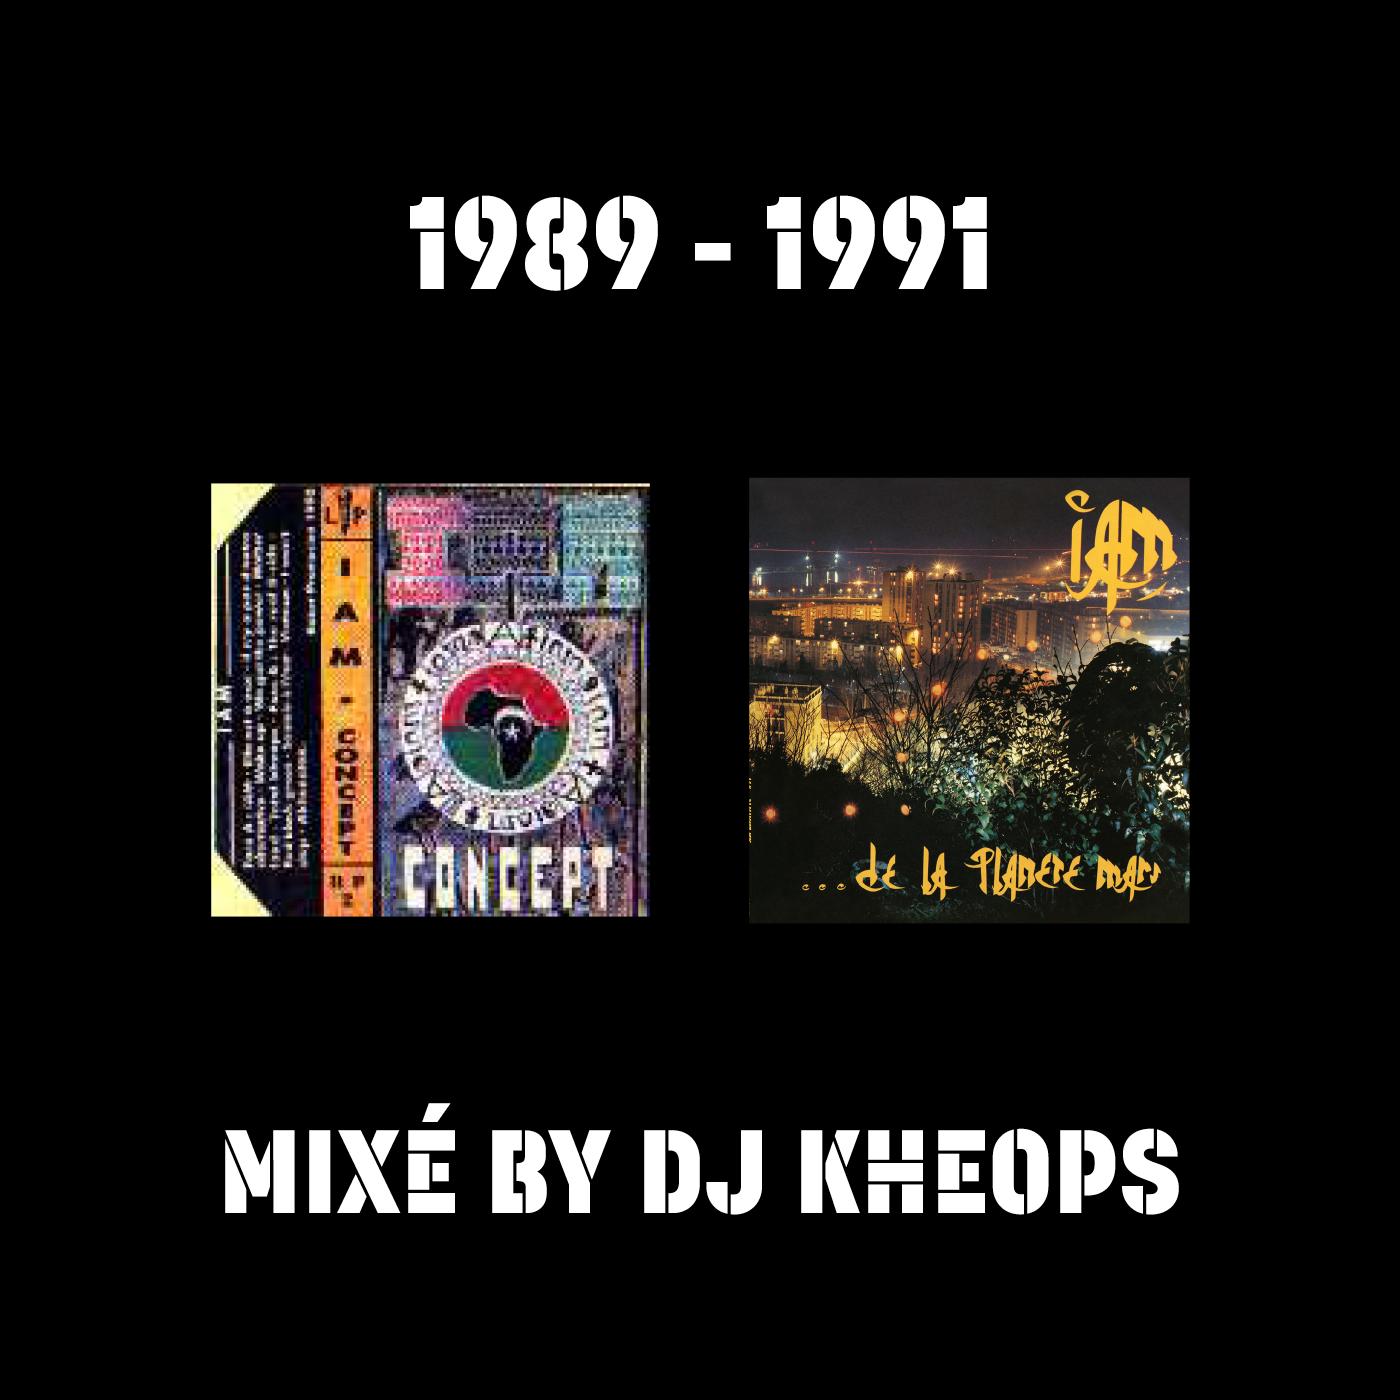 CONCEPT - DE LA PLANETE MARS MIXE BY DJ KHEOPS